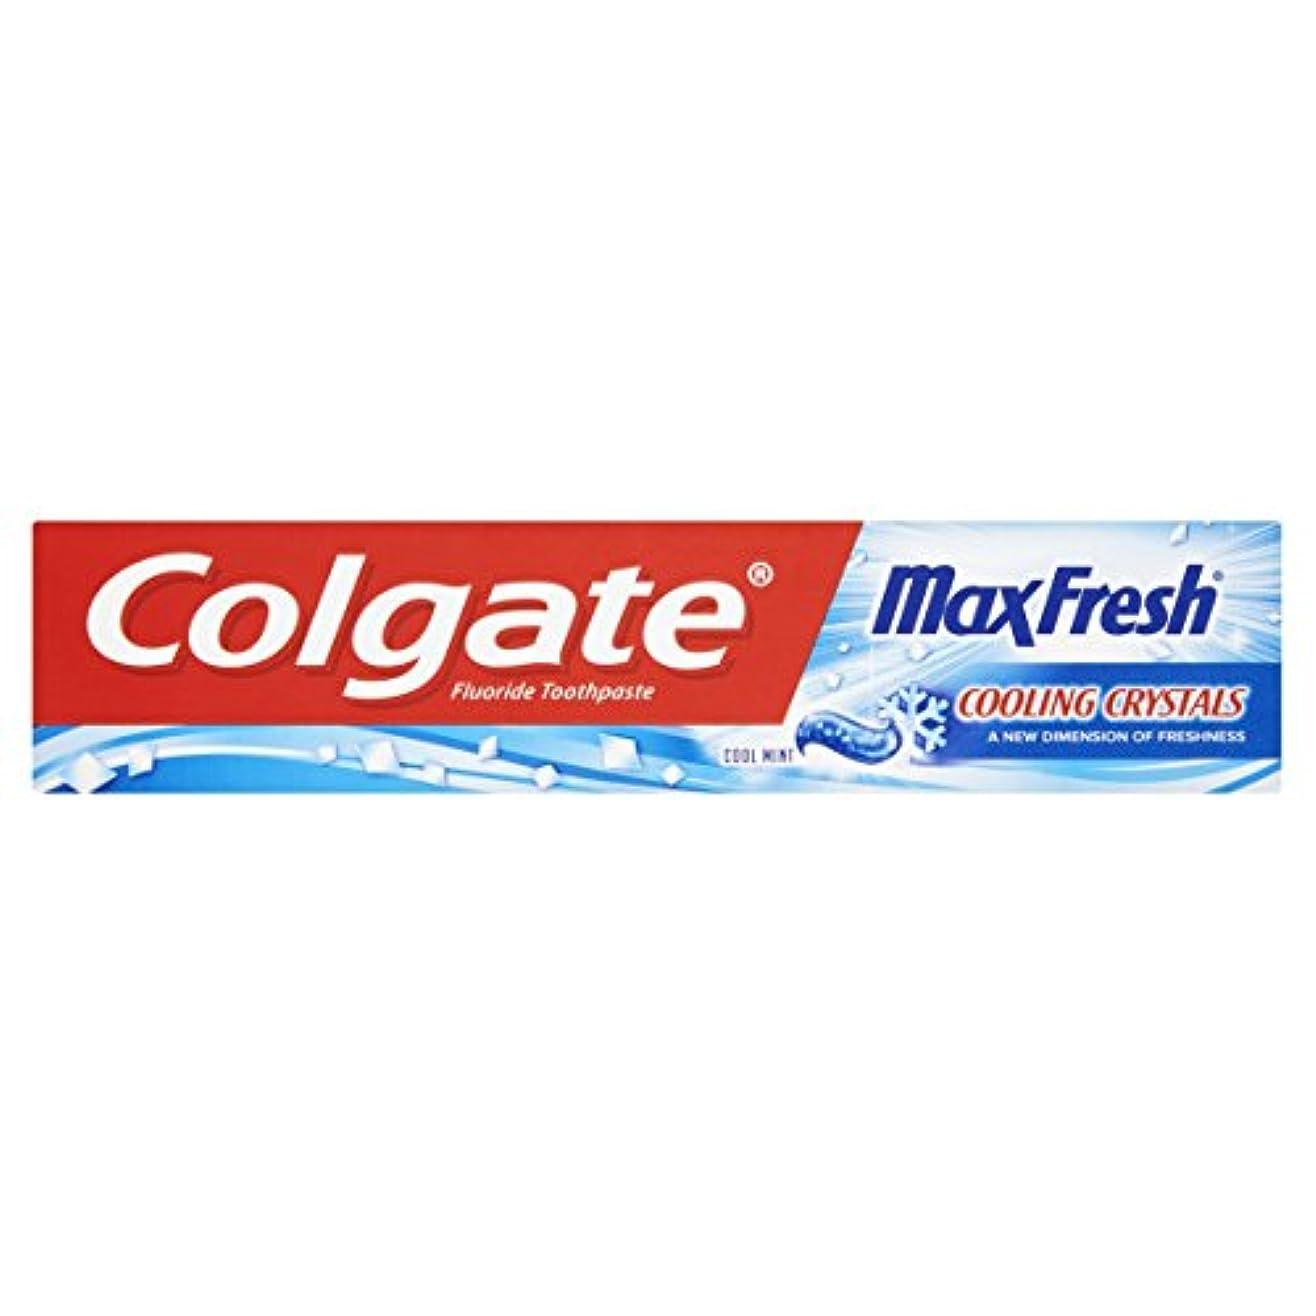 [Colgate ] コルゲート最大の新鮮な青歯磨き粉の125ミリリットル - Colgate Max Fresh Blue Toothpaste 125Ml [並行輸入品]